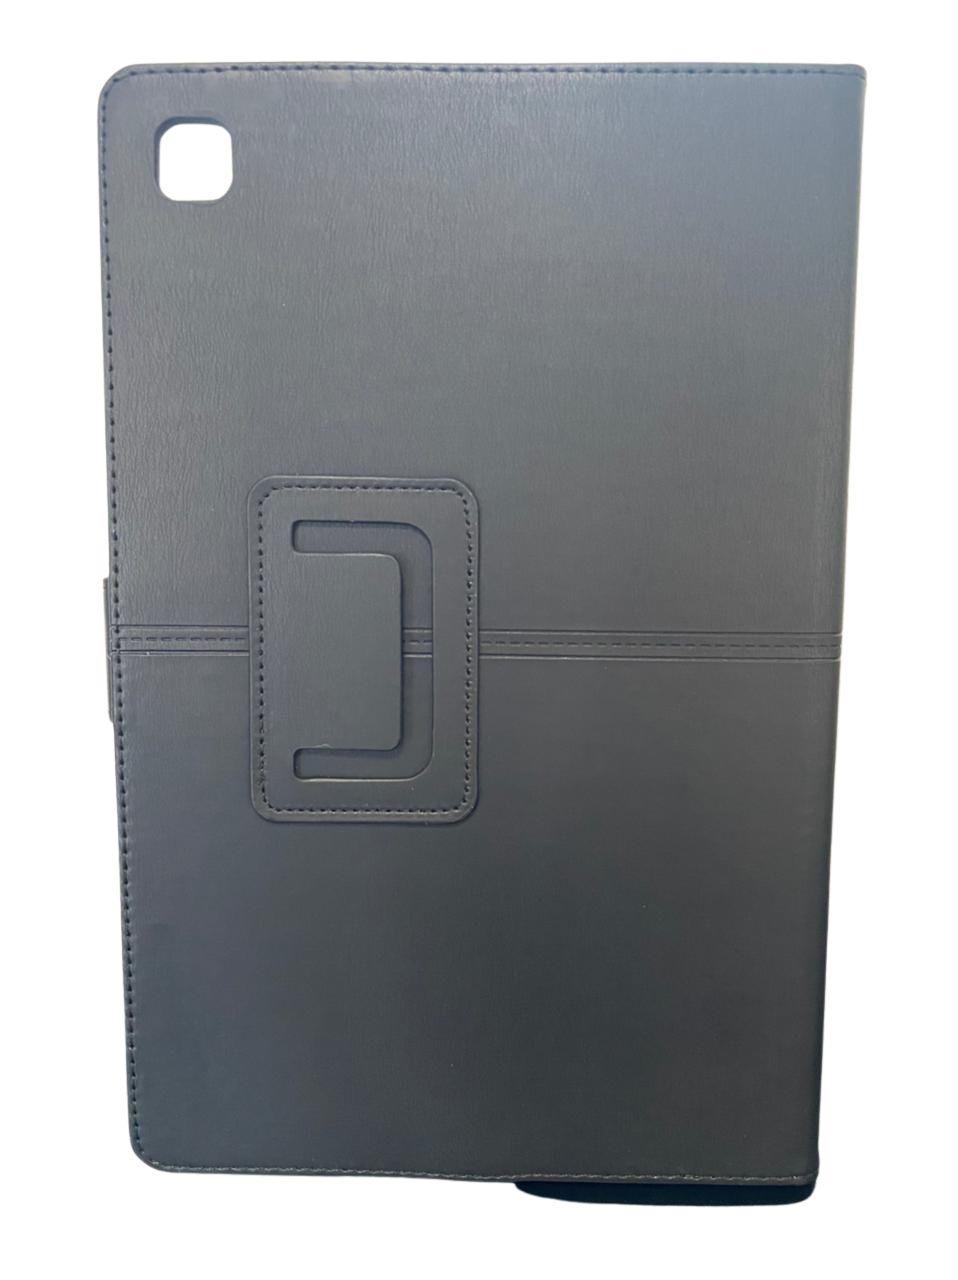 Capa Tablet Samsung Galaxy Tab A7 10.4 T500 T505 Magnética Carteira Dobrável Preta